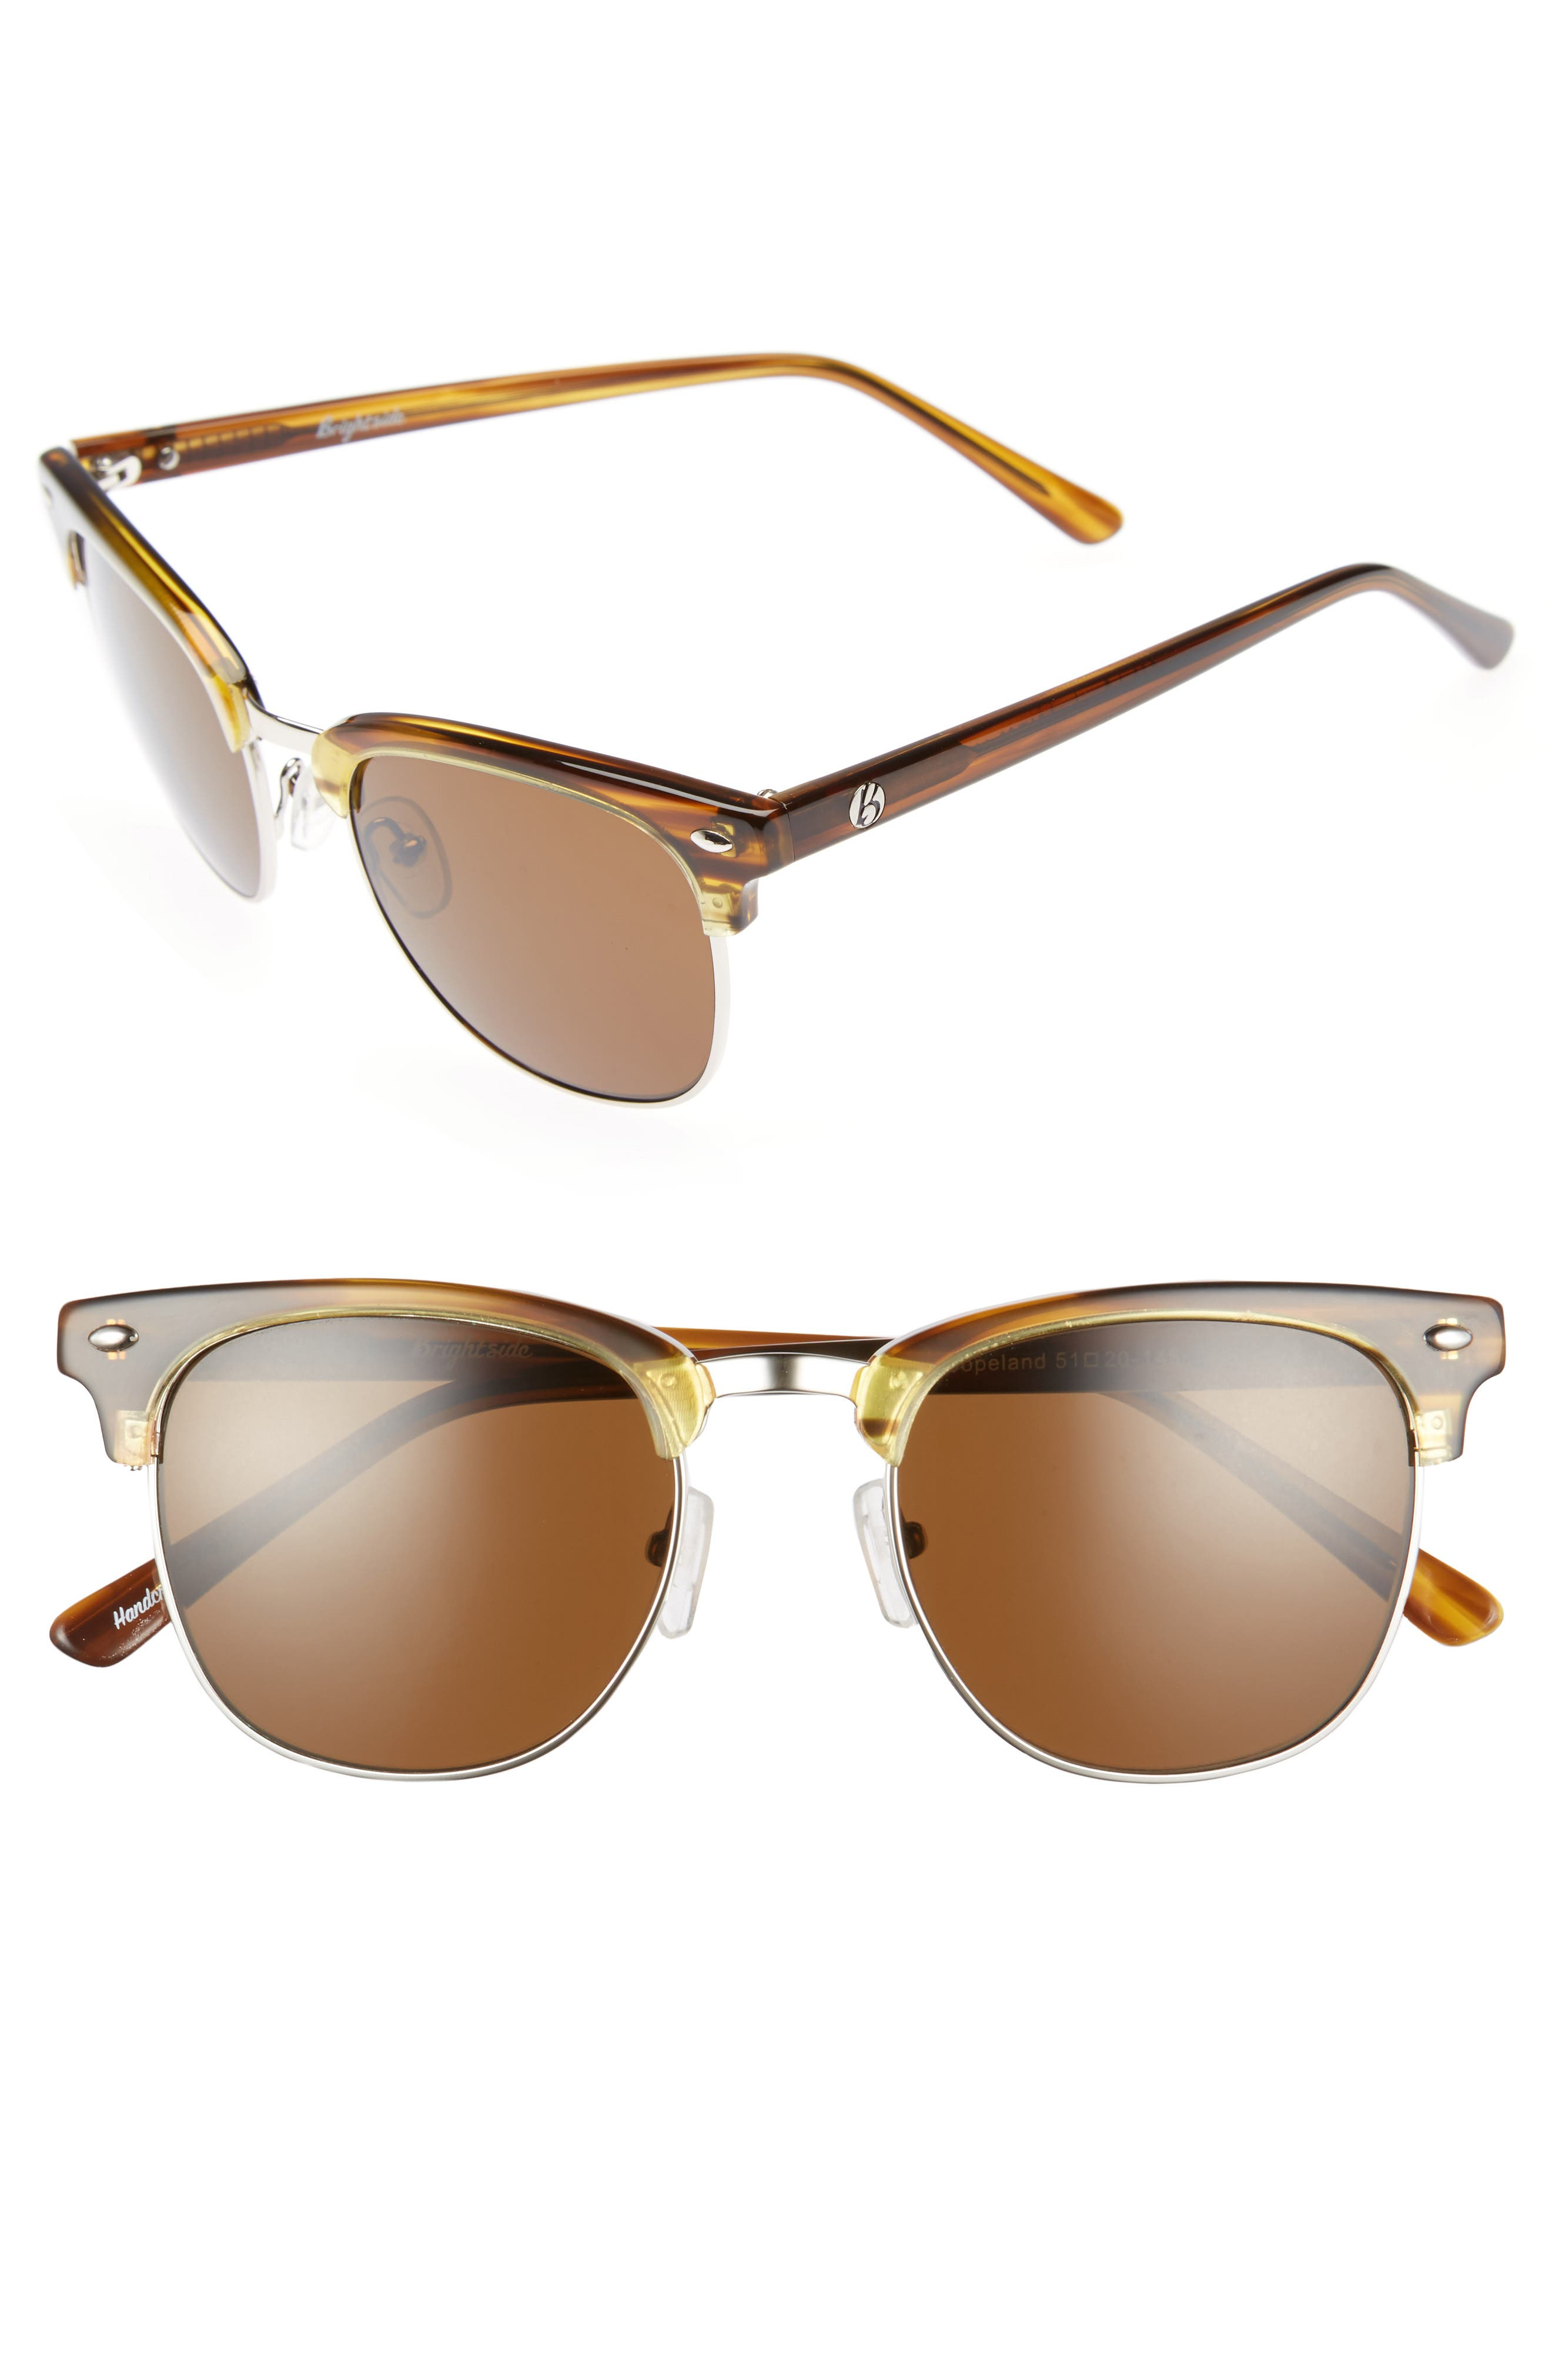 Brightside Copeland 51mm Sunglasses